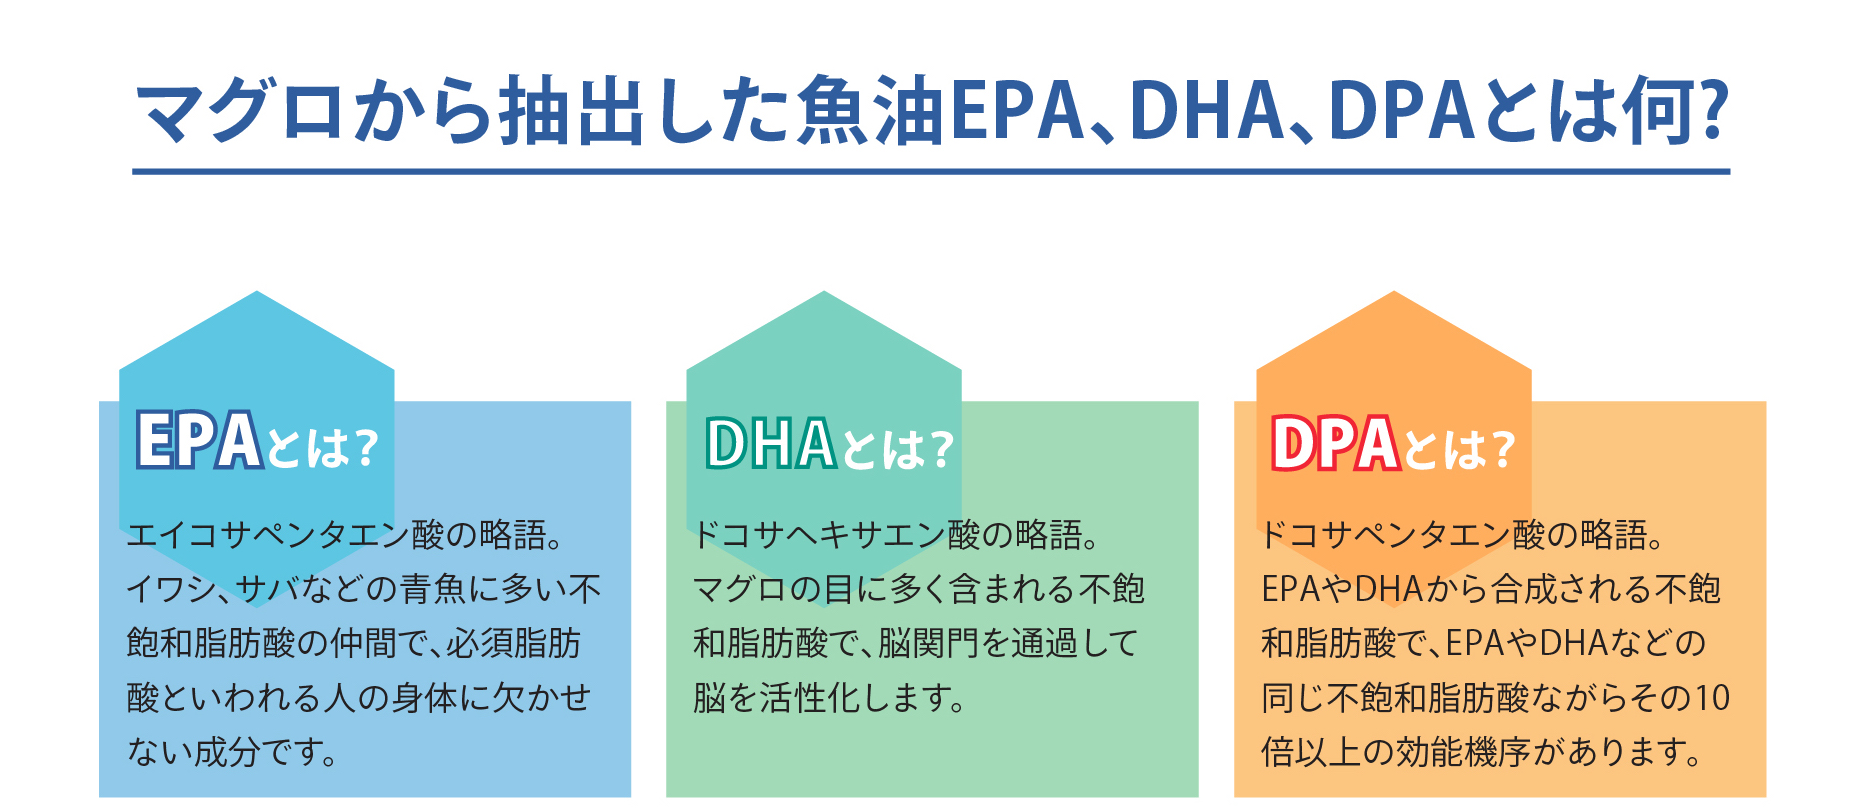 DHA・EPA・DPAの説明